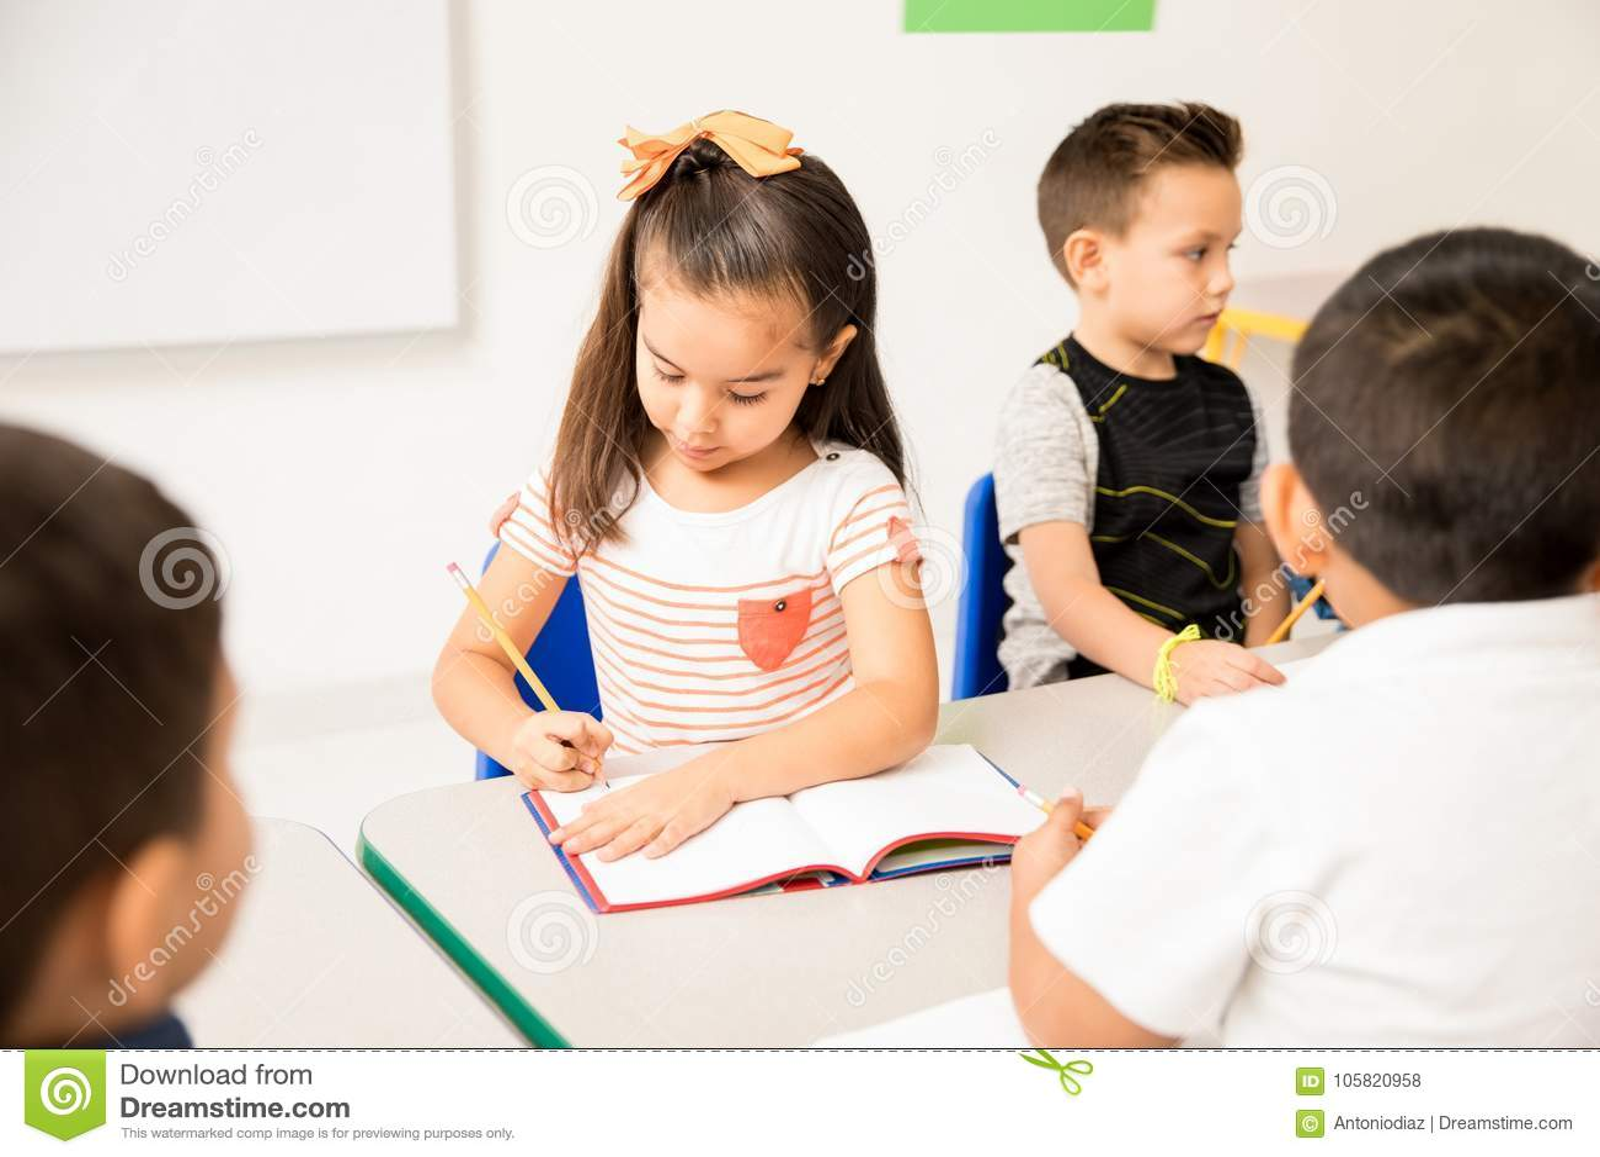 Hispanic preschool girl working in class